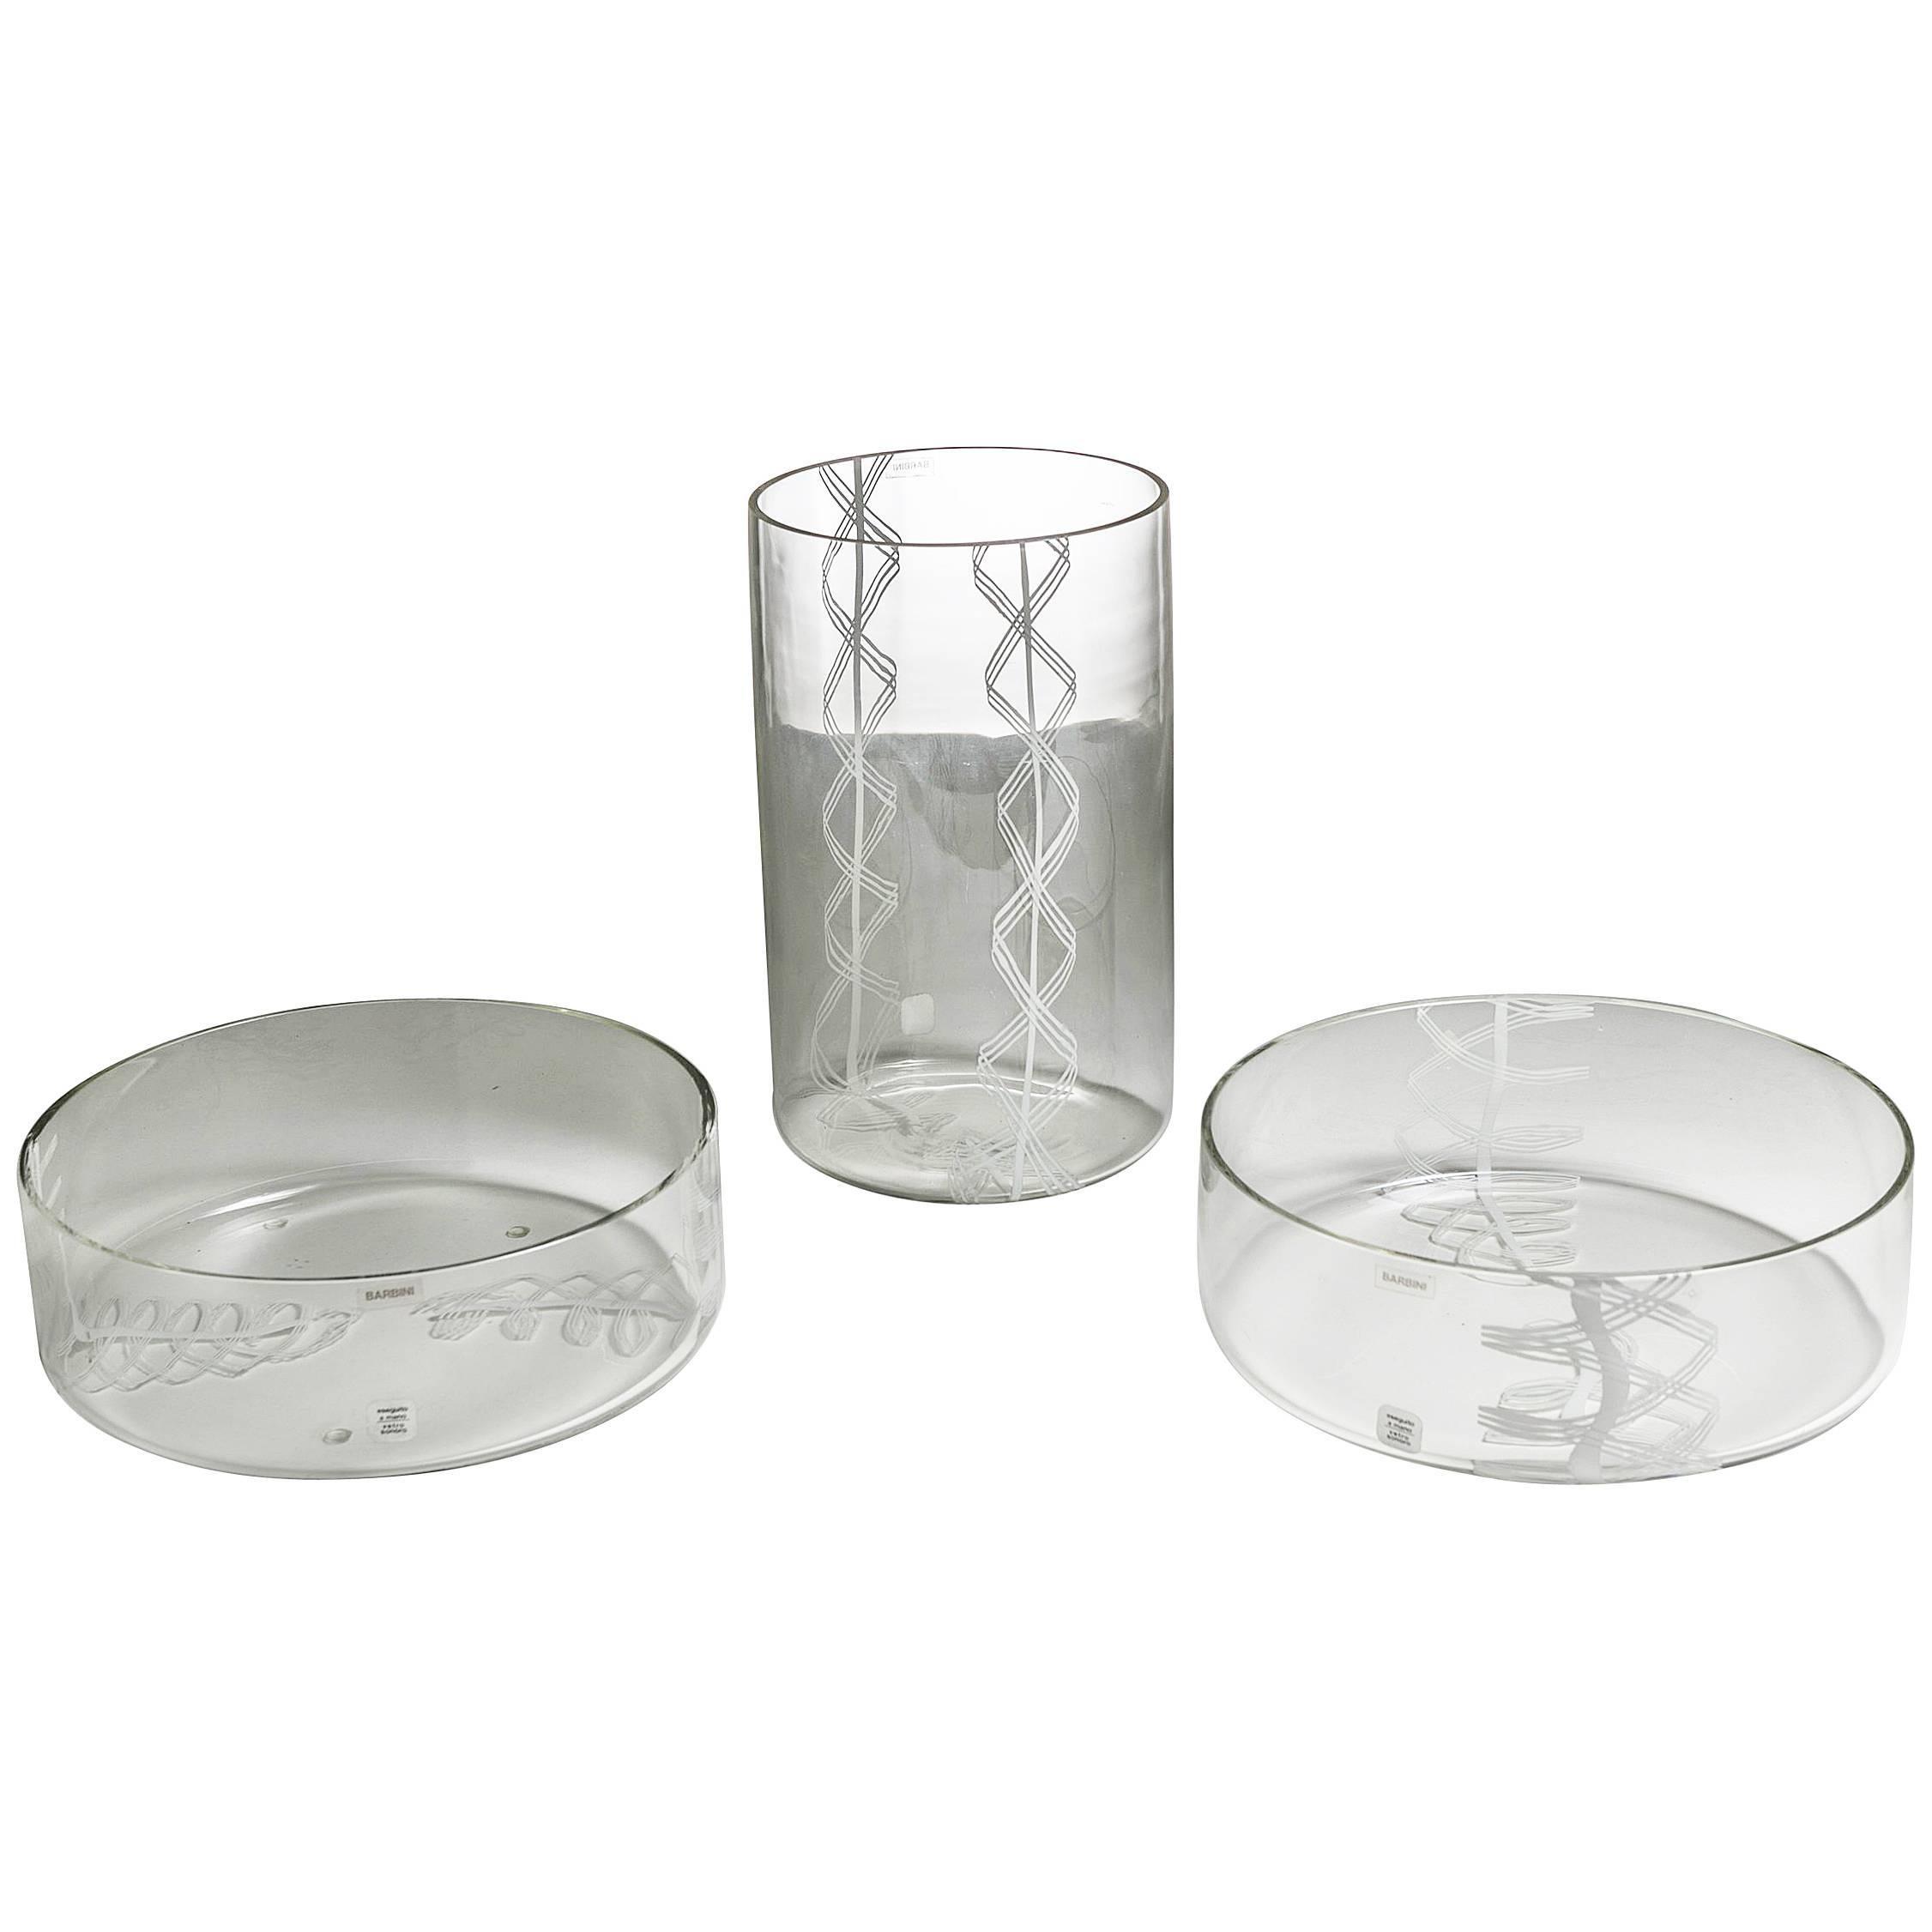 Set of Three Vases by Barbini